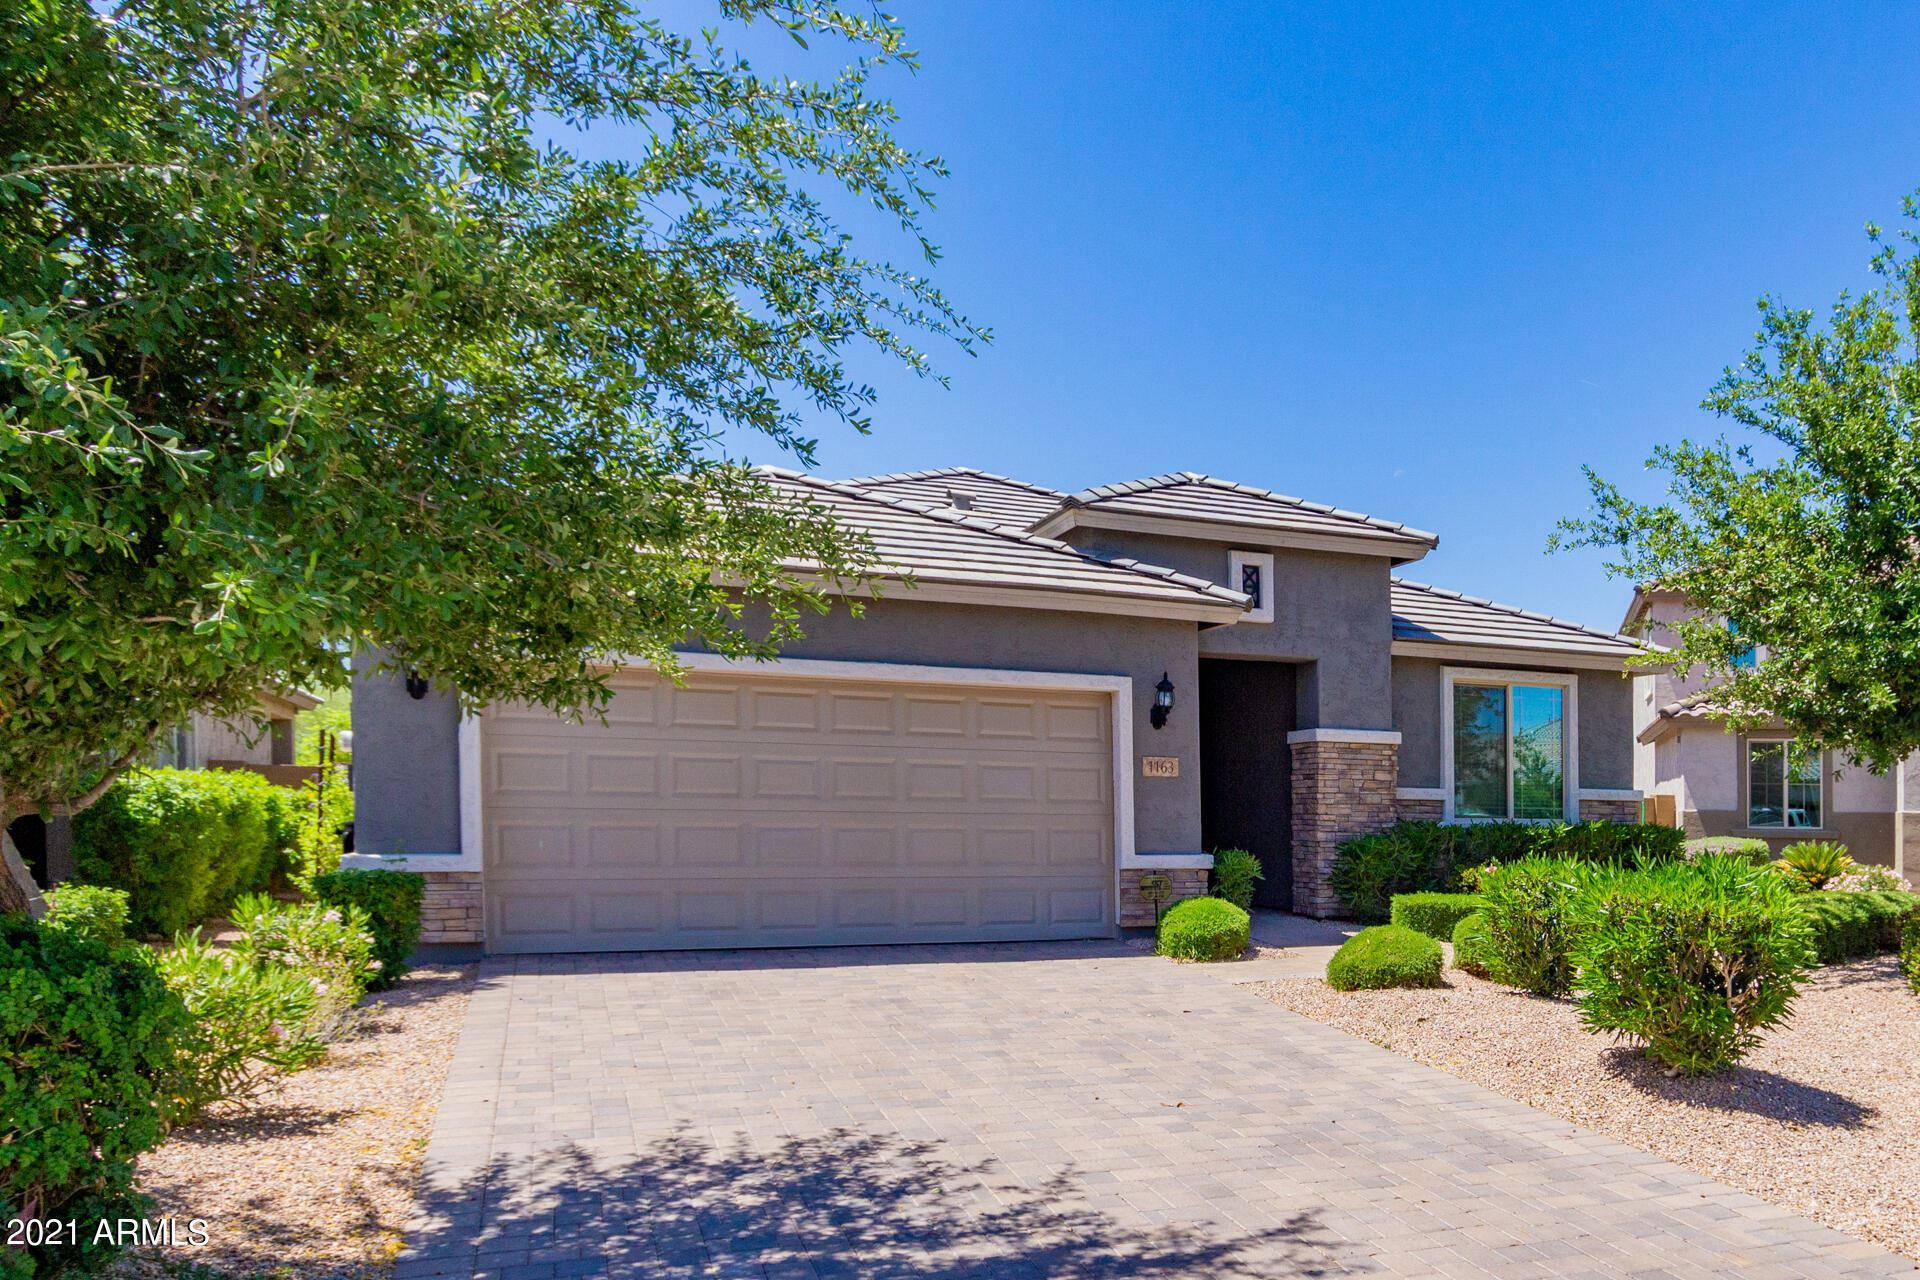 Photo of 1163 W ANGUS Road, San Tan Valley, AZ 85143 (MLS # 6231618)